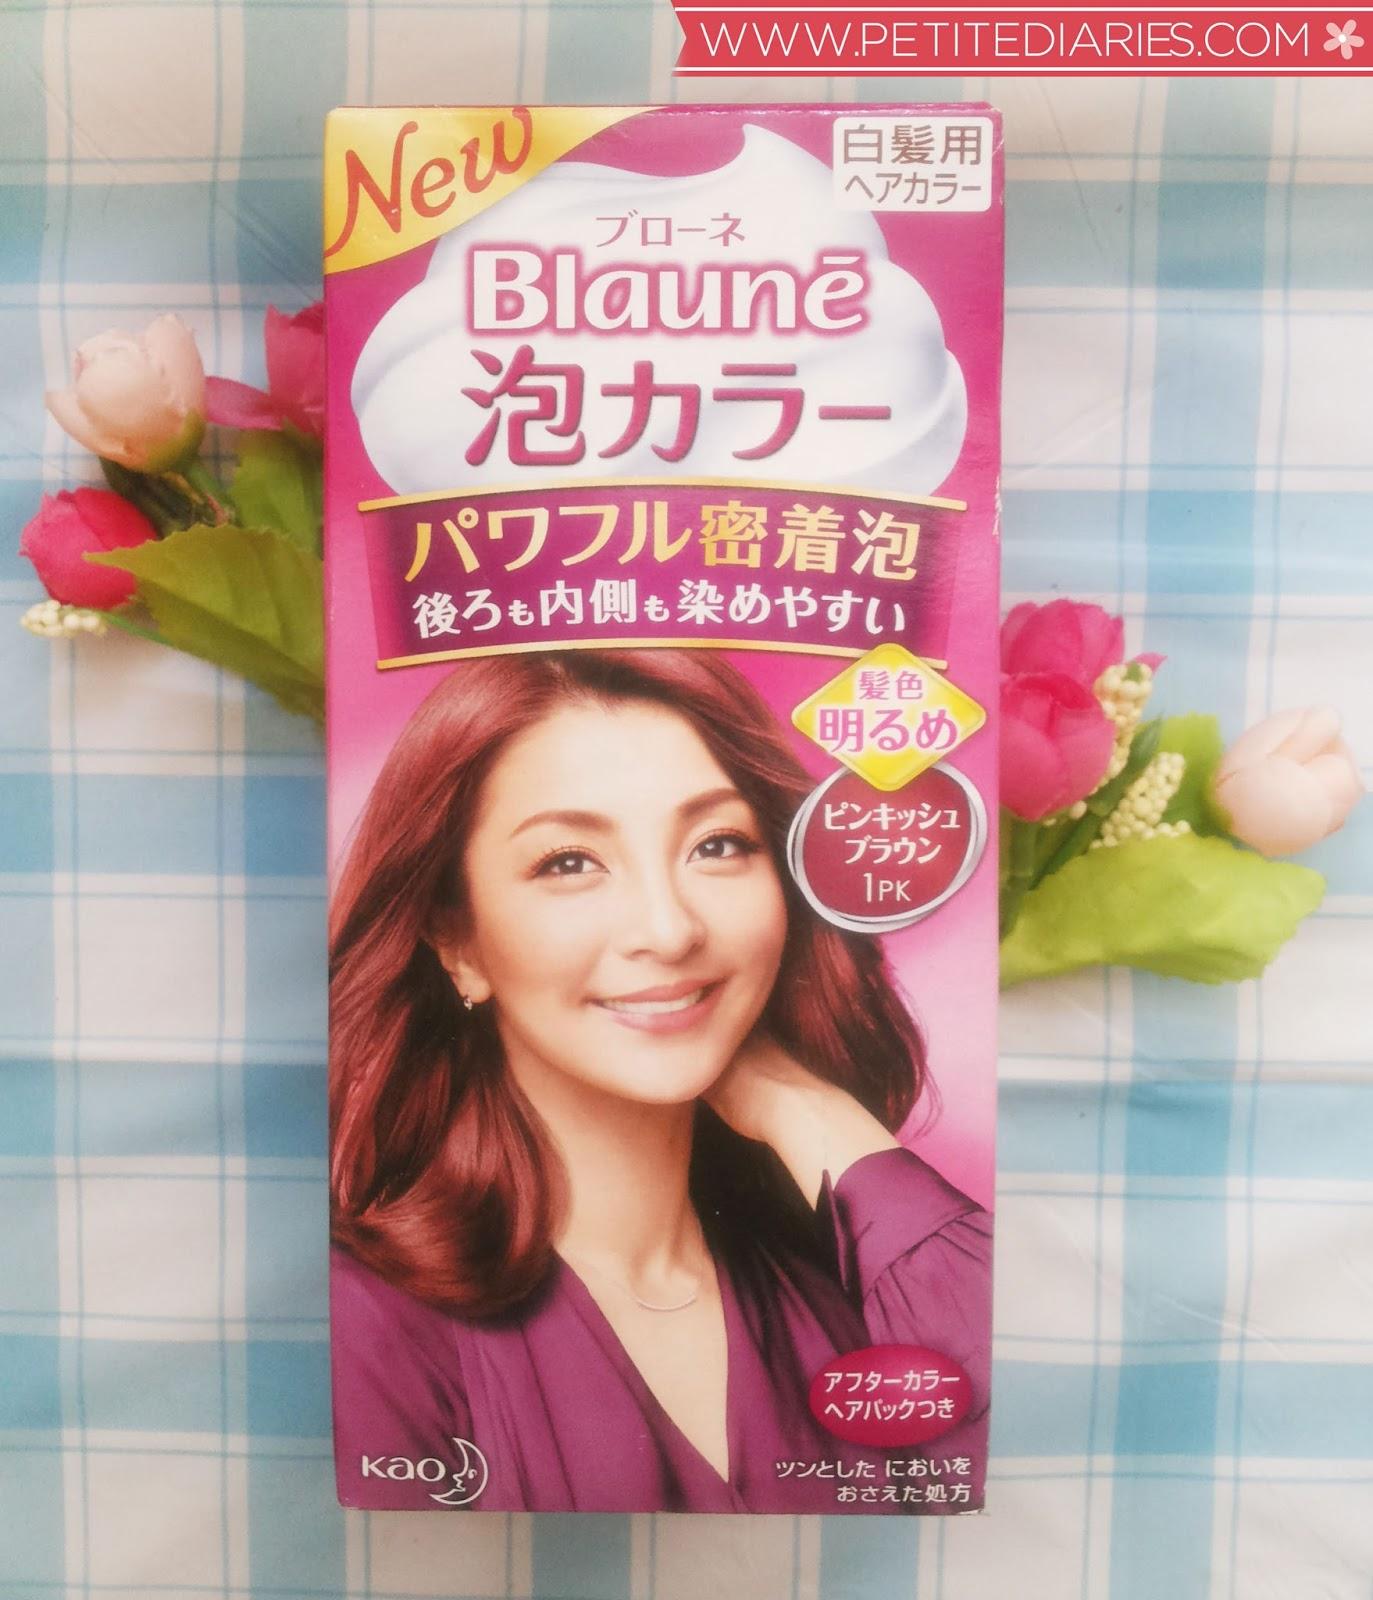 Review kao blaune japanese bubble hair color in 01 pk pink brown kao blaune 01 pk pink brown nvjuhfo Choice Image